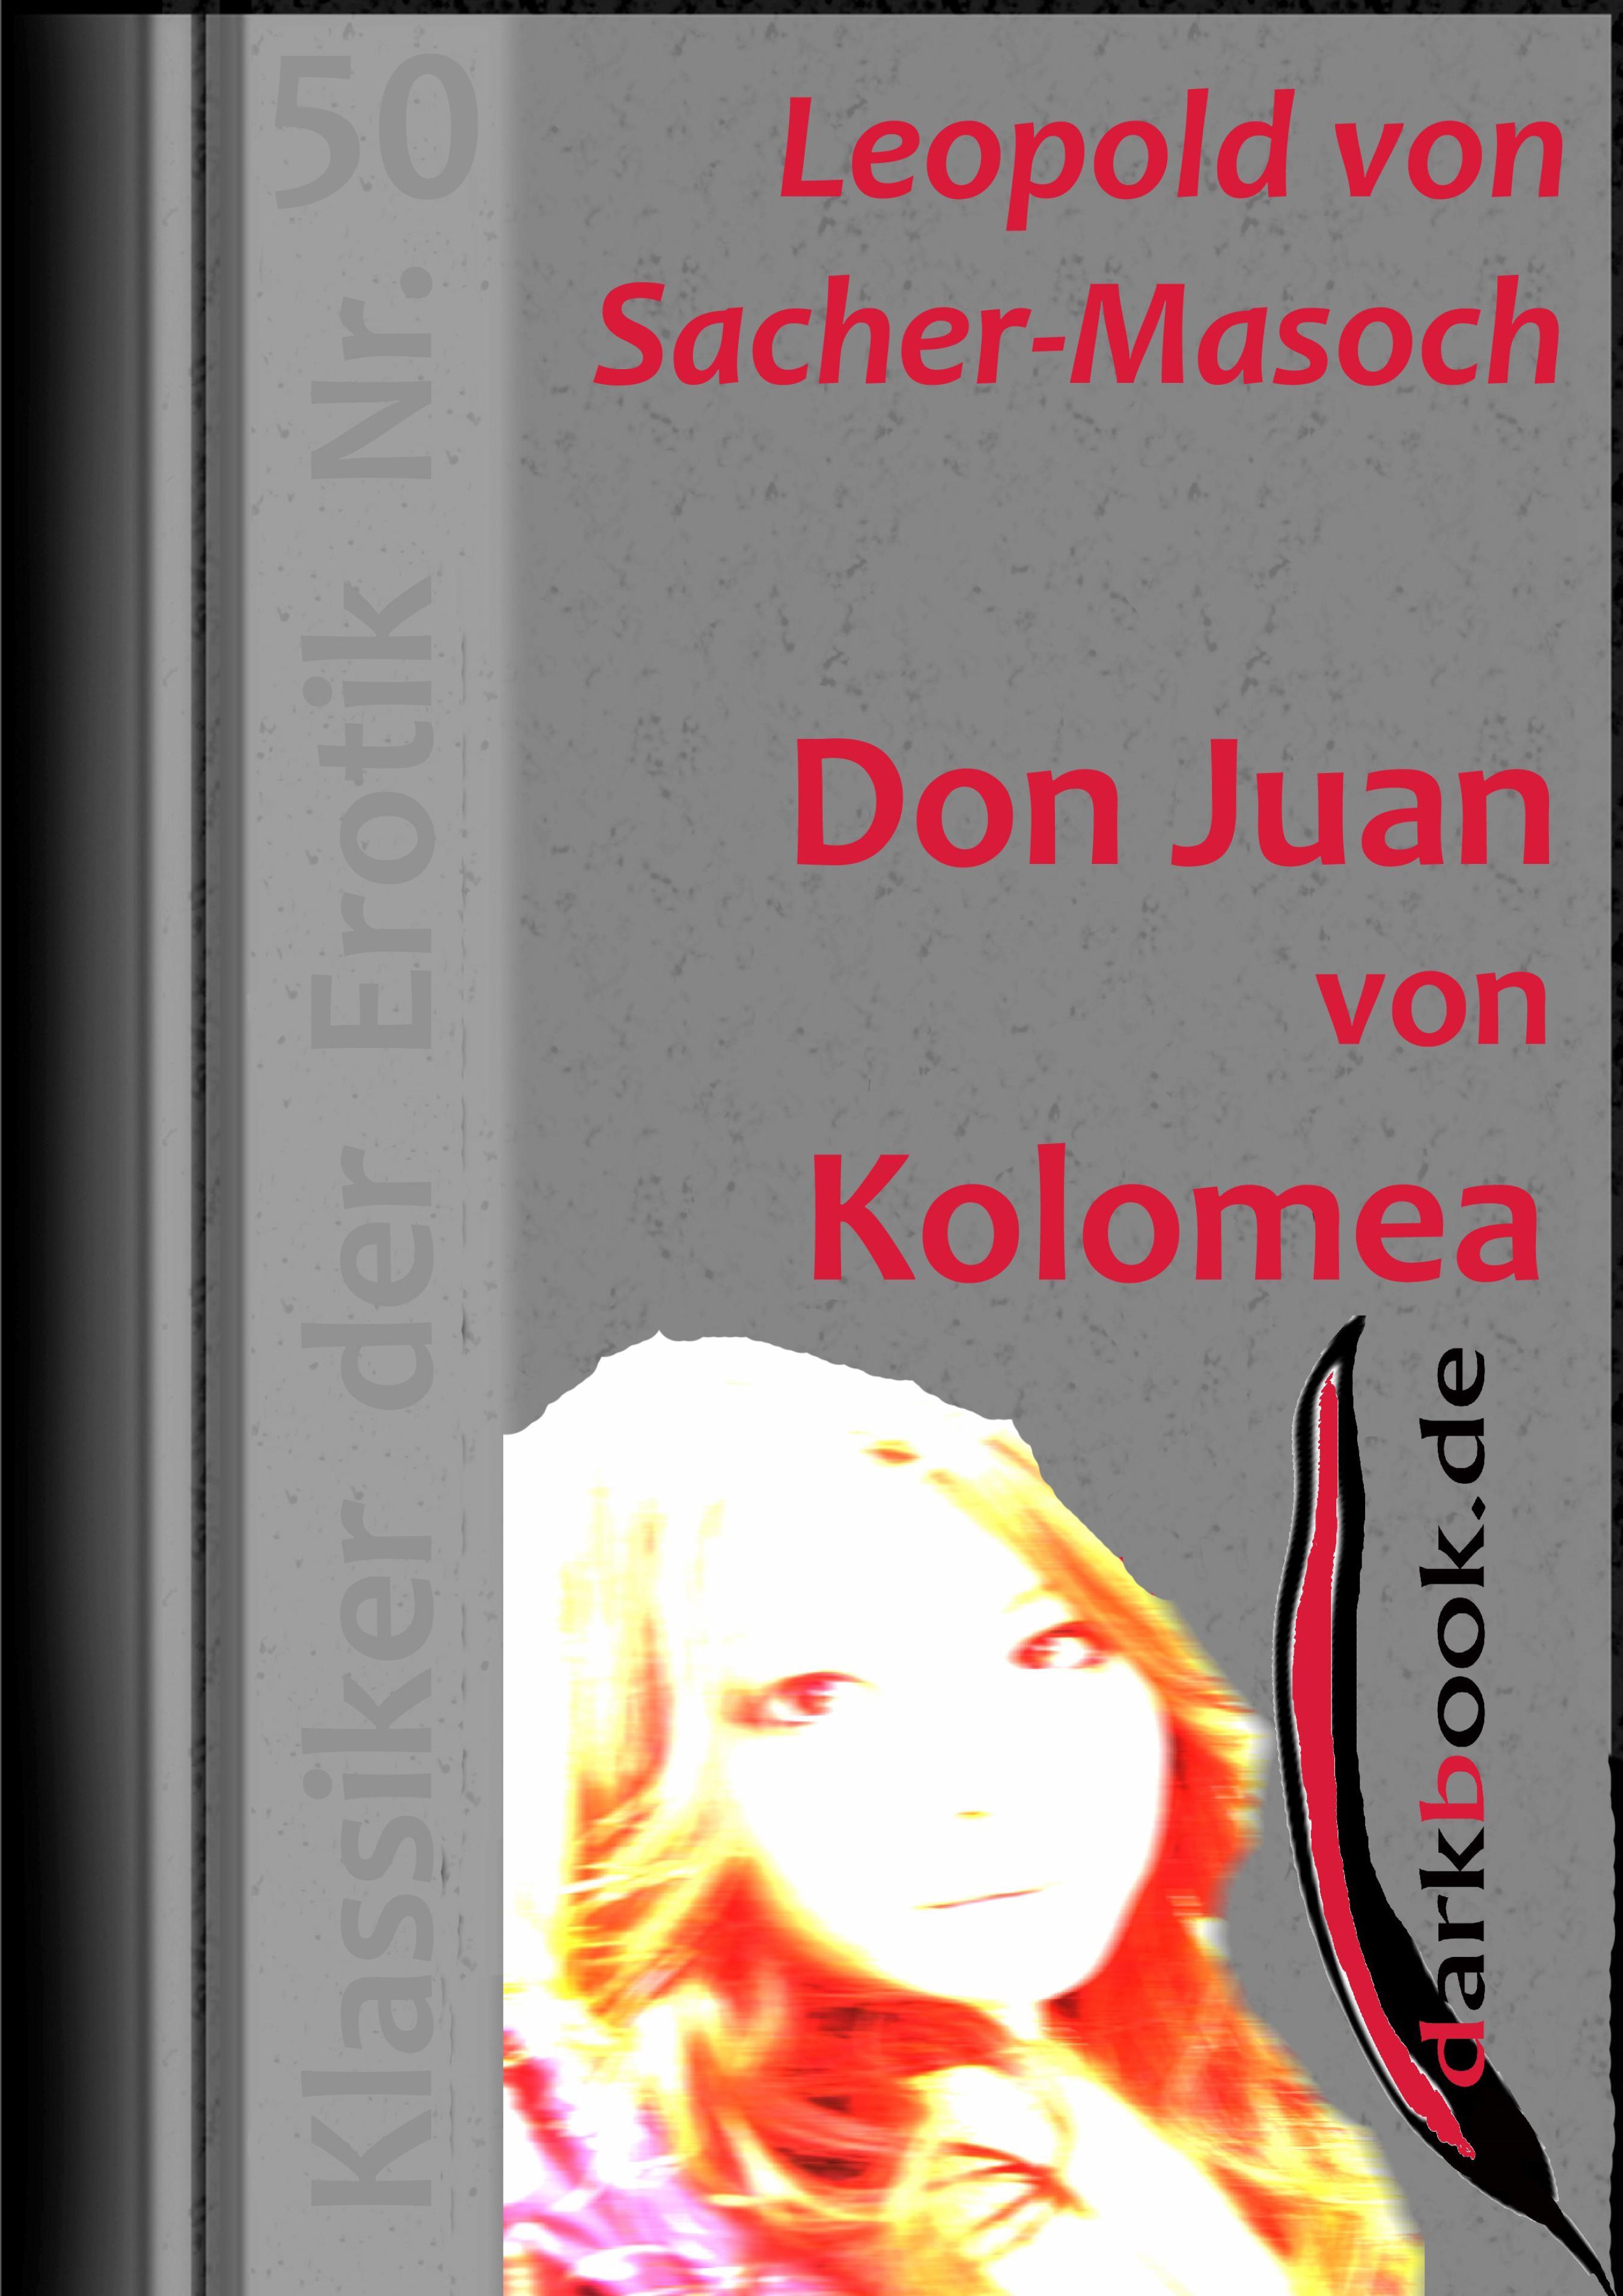 цена Леопольд фон Захер-Мазох Don Juan von Kolomea онлайн в 2017 году